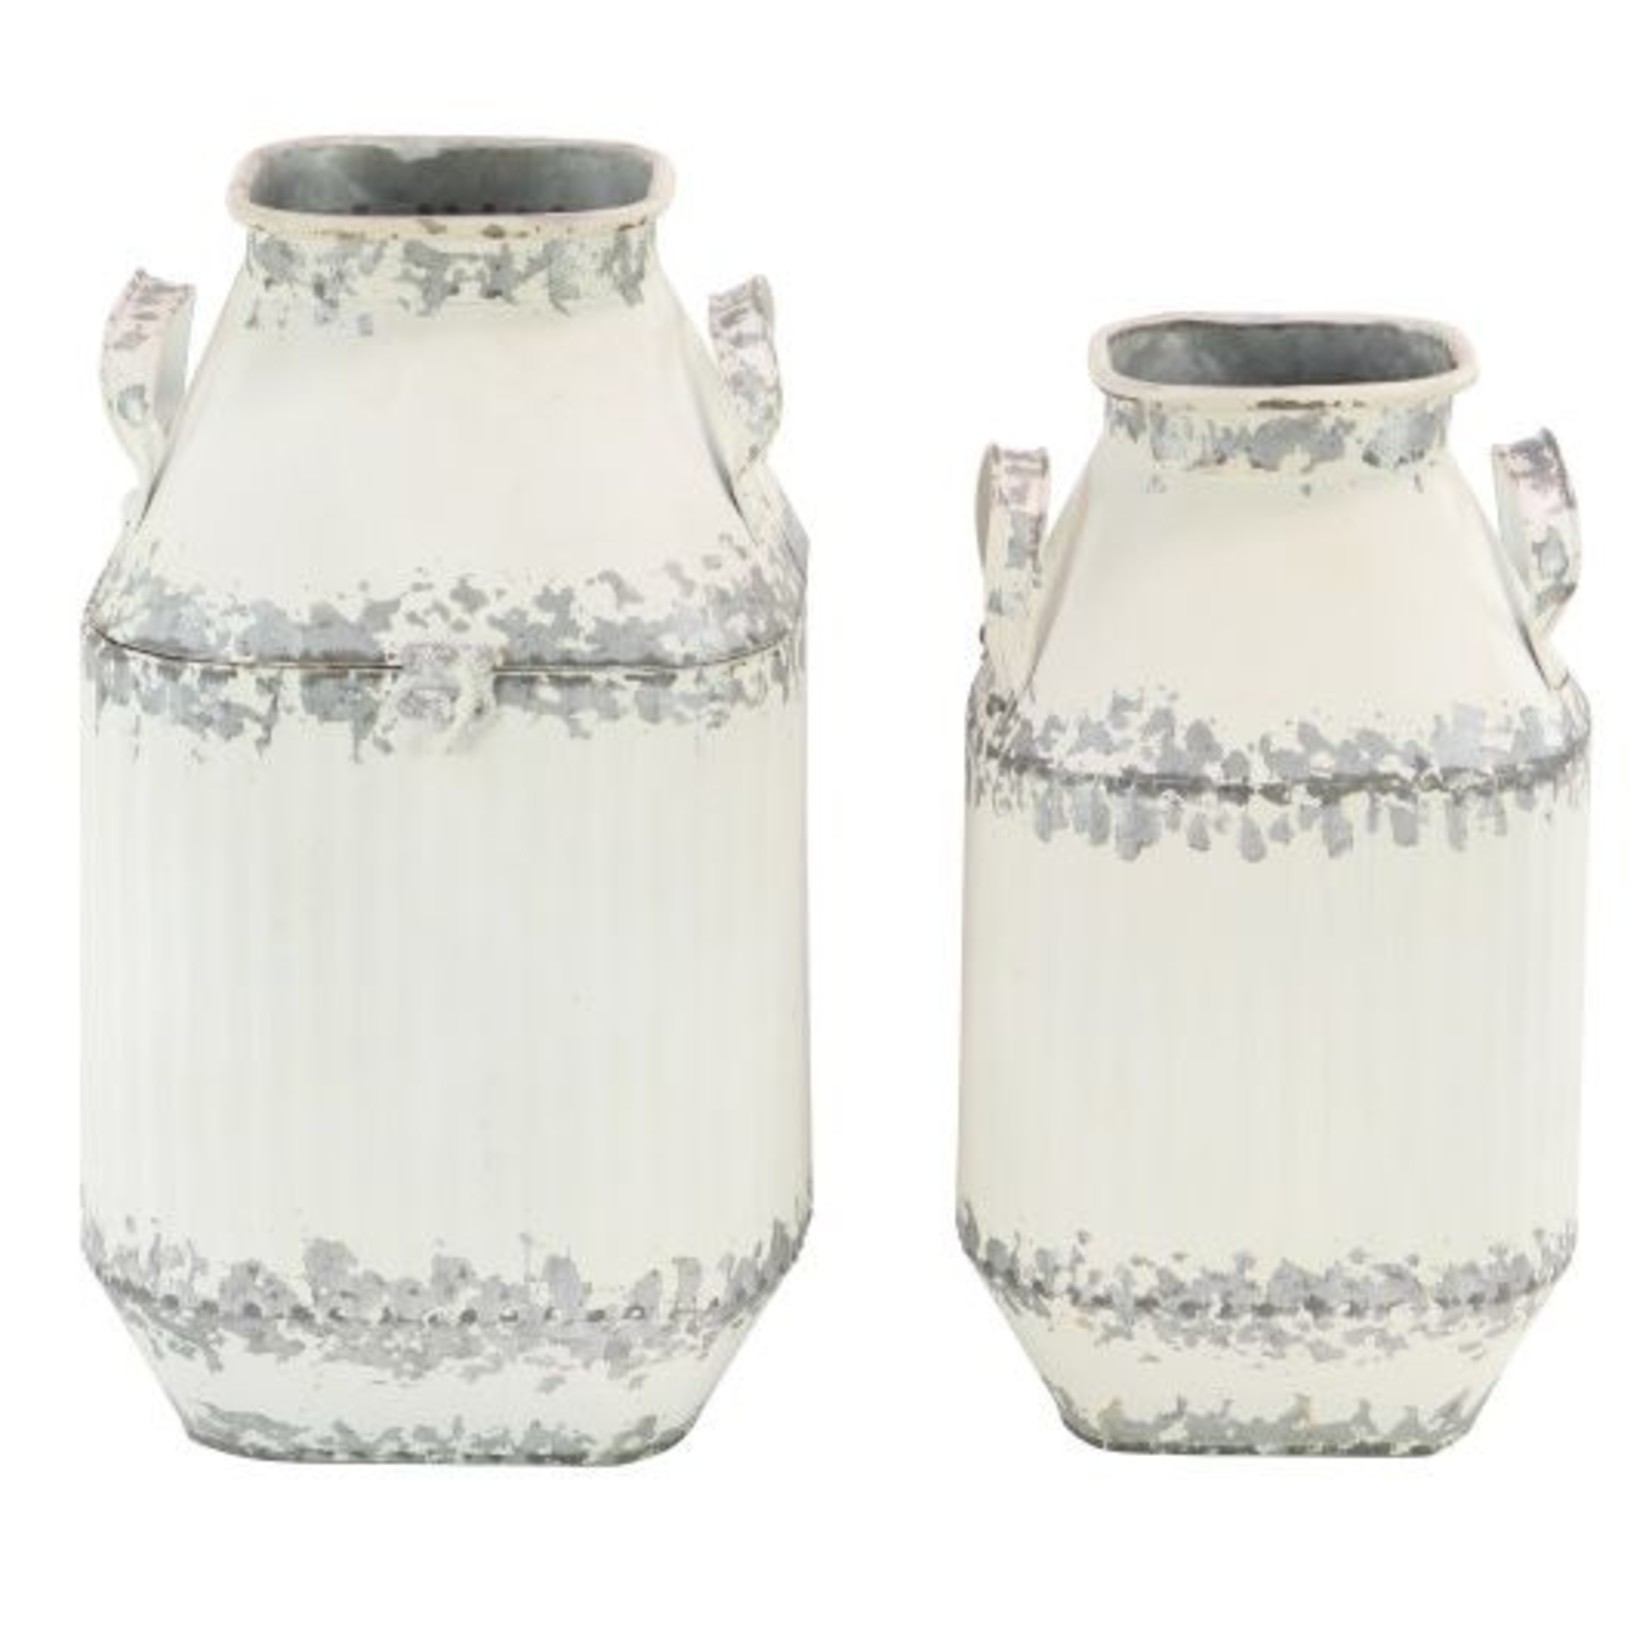 Galvanized and White Milk Can Small 98480